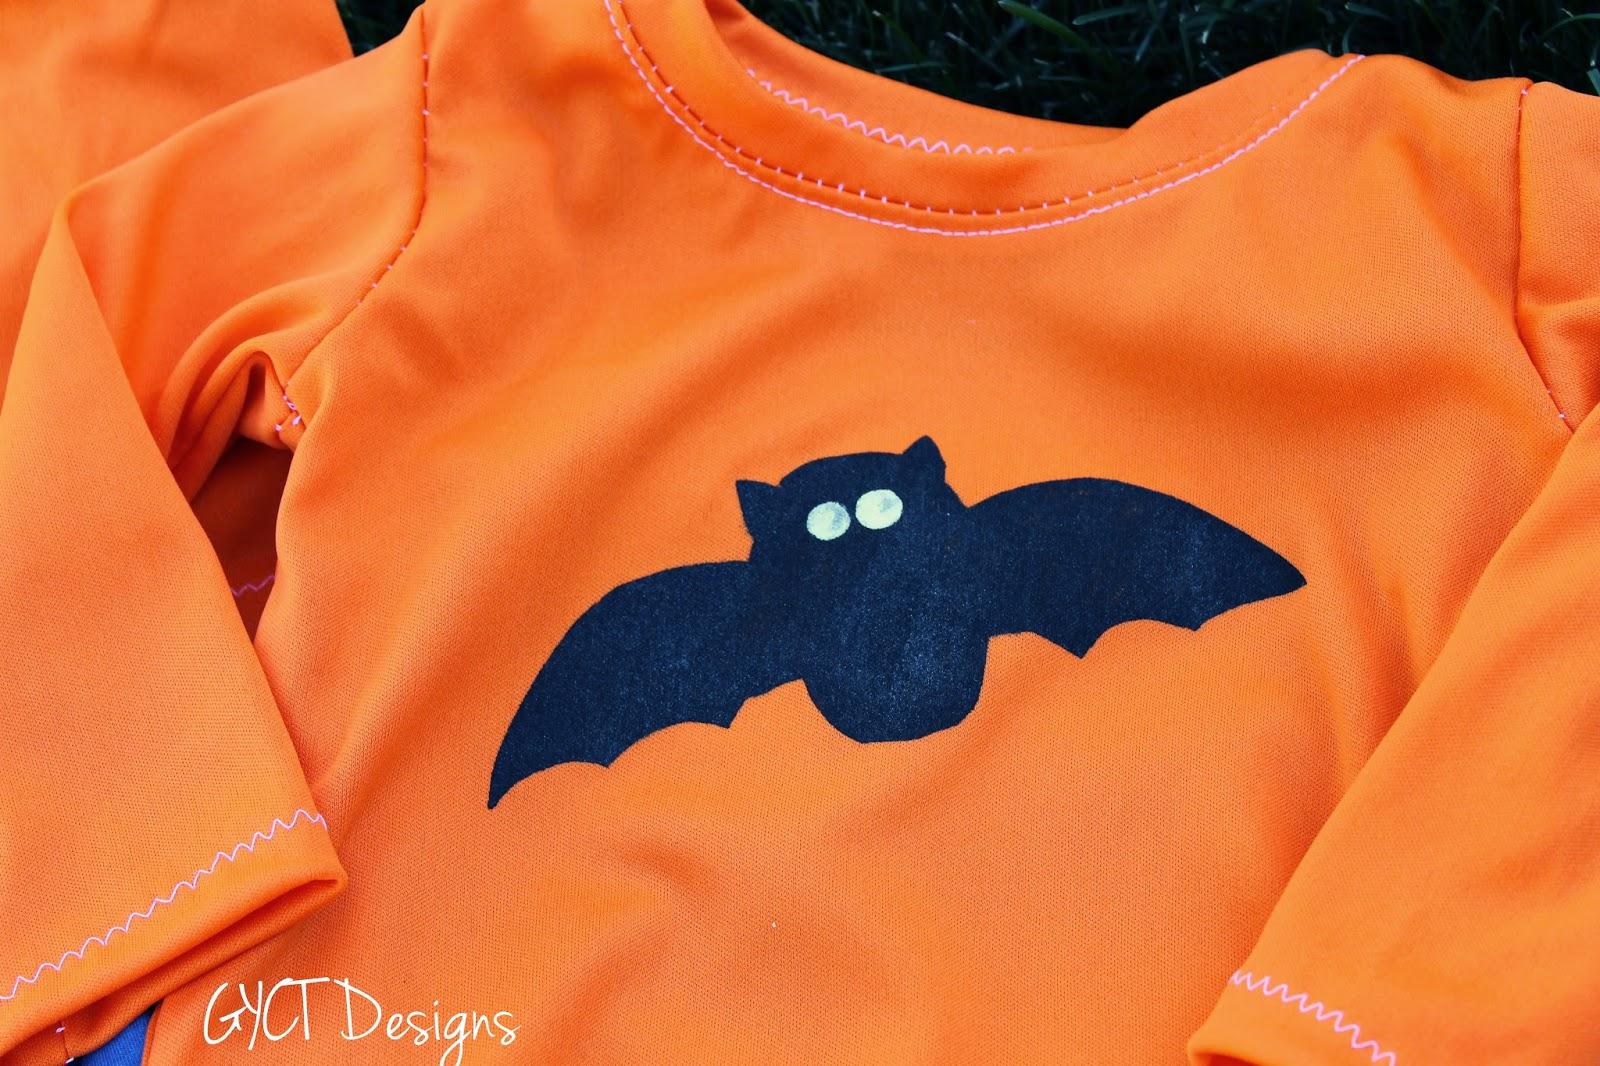 Halloween Pajamas With Free Bat Template From Gyct